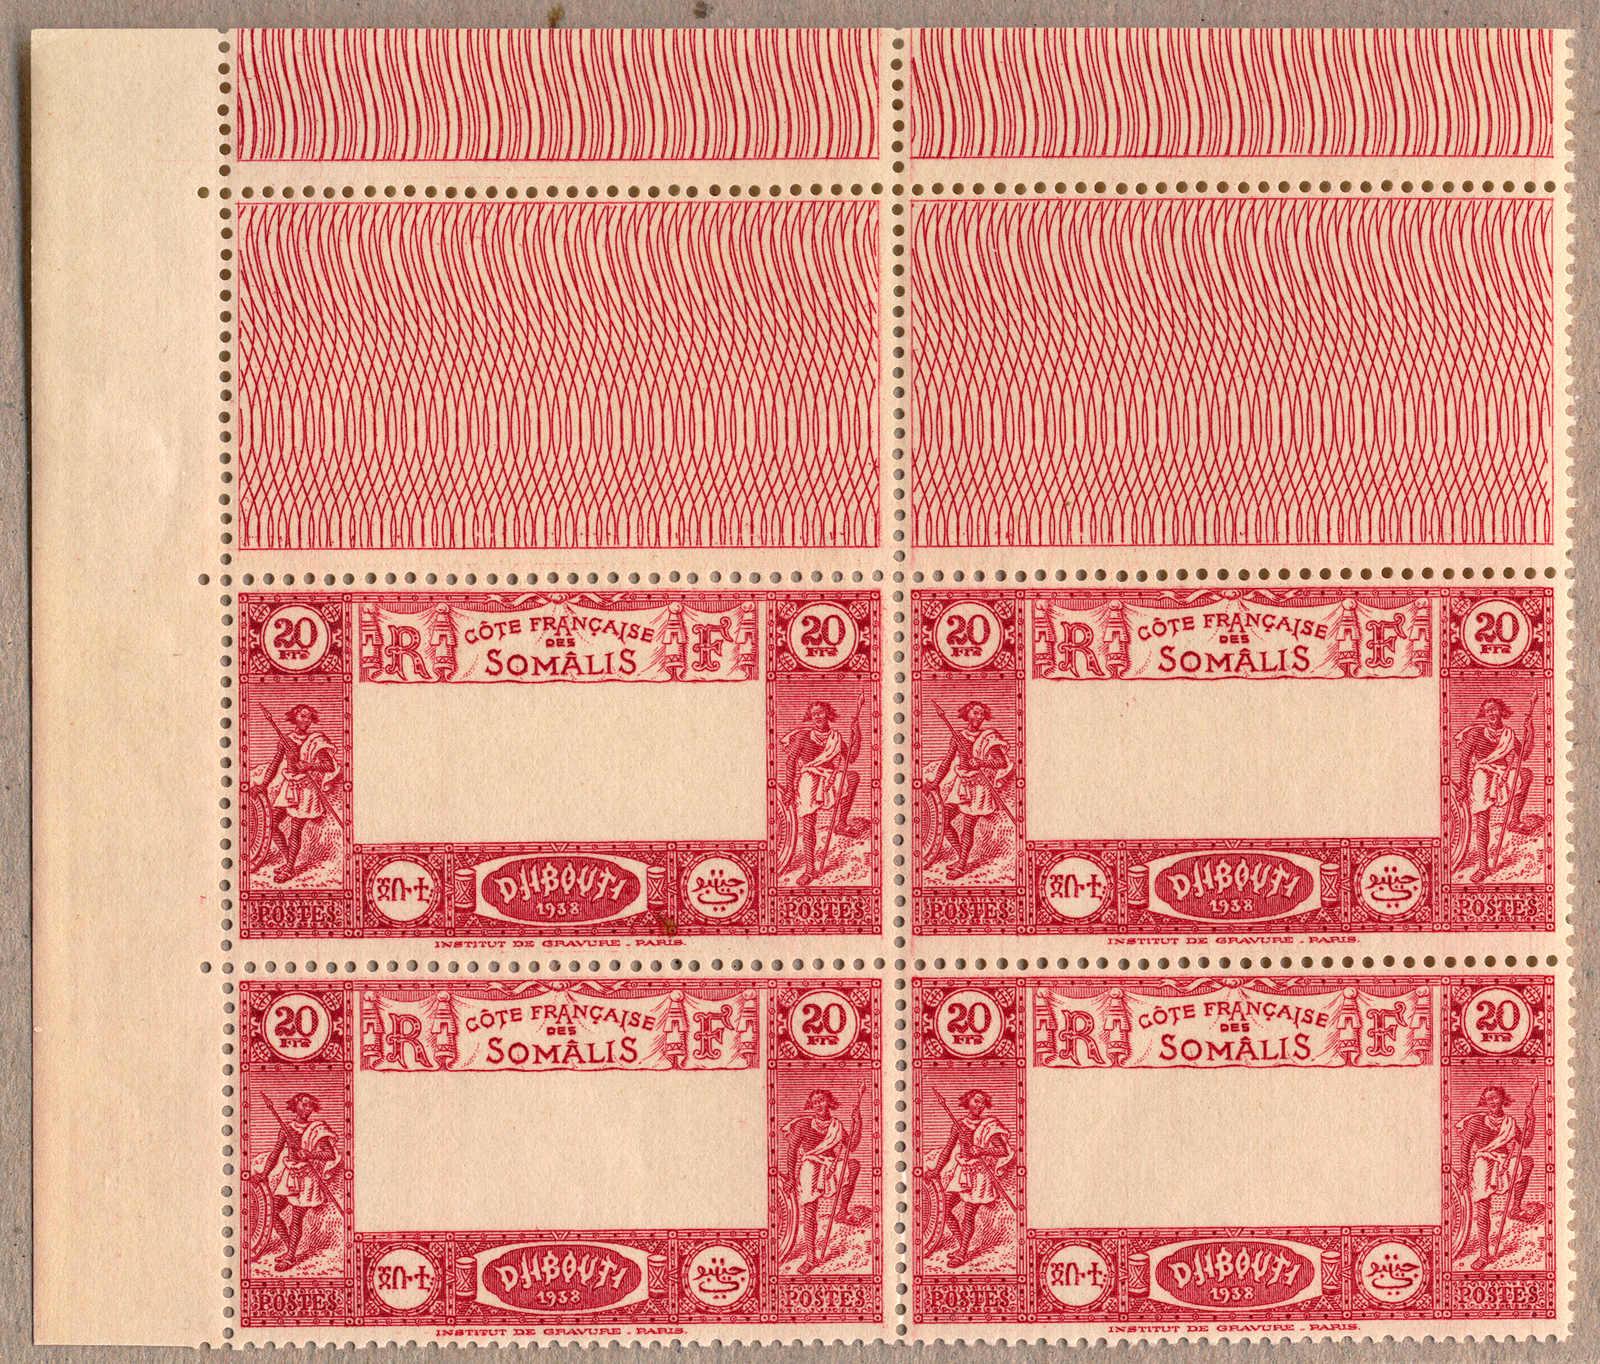 Lot 10105 - french colonies djibouti -  classicphil GmbH 3 rd classicphil Auction - VIENNA- AUSTRIA